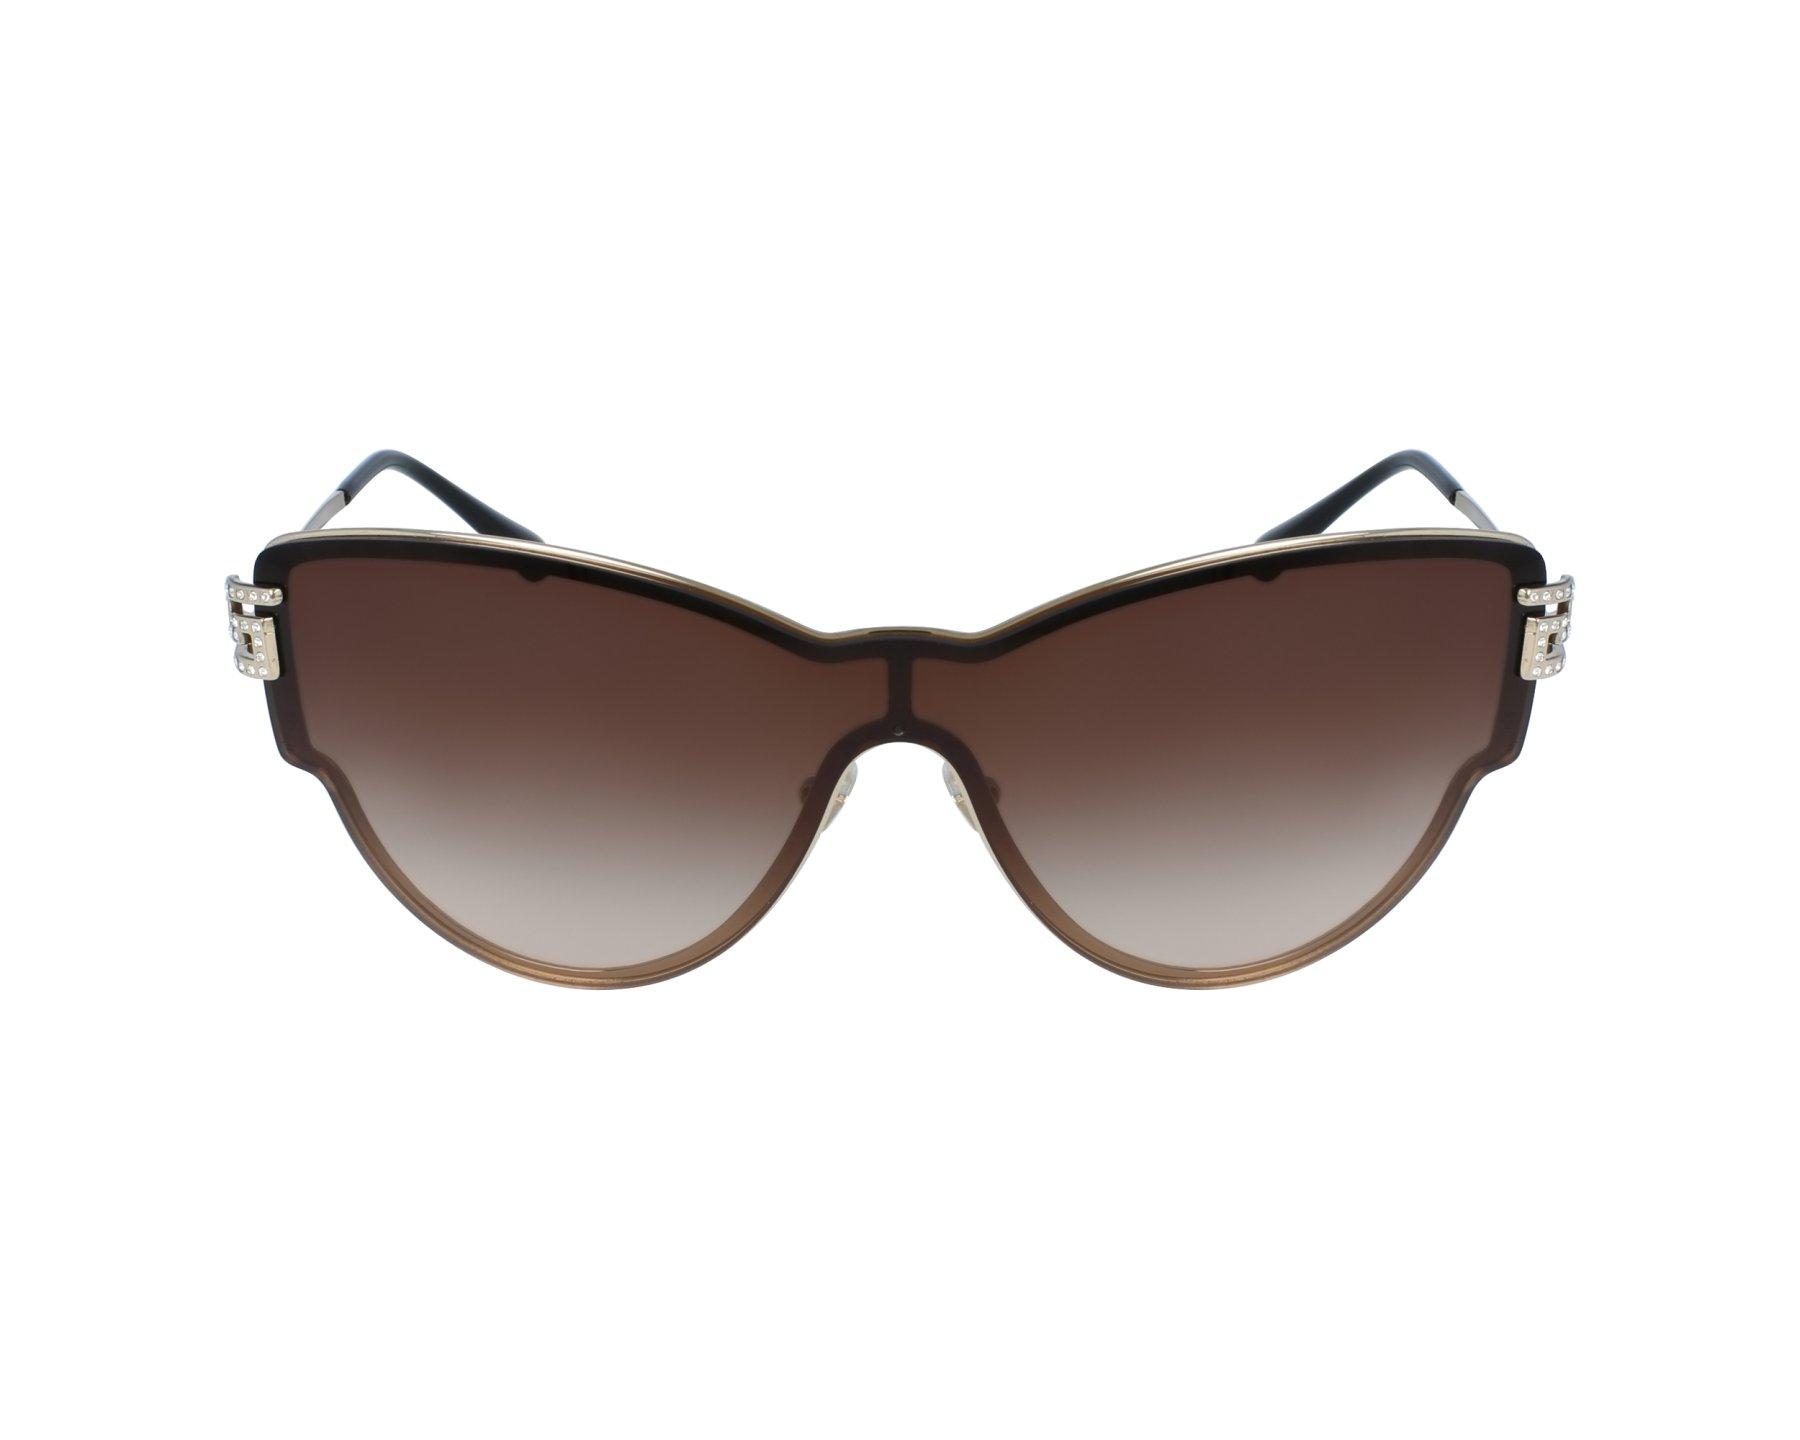 lunettes de soleil versace ve 2172 b 1252 13 or pas cher visionet. Black Bedroom Furniture Sets. Home Design Ideas